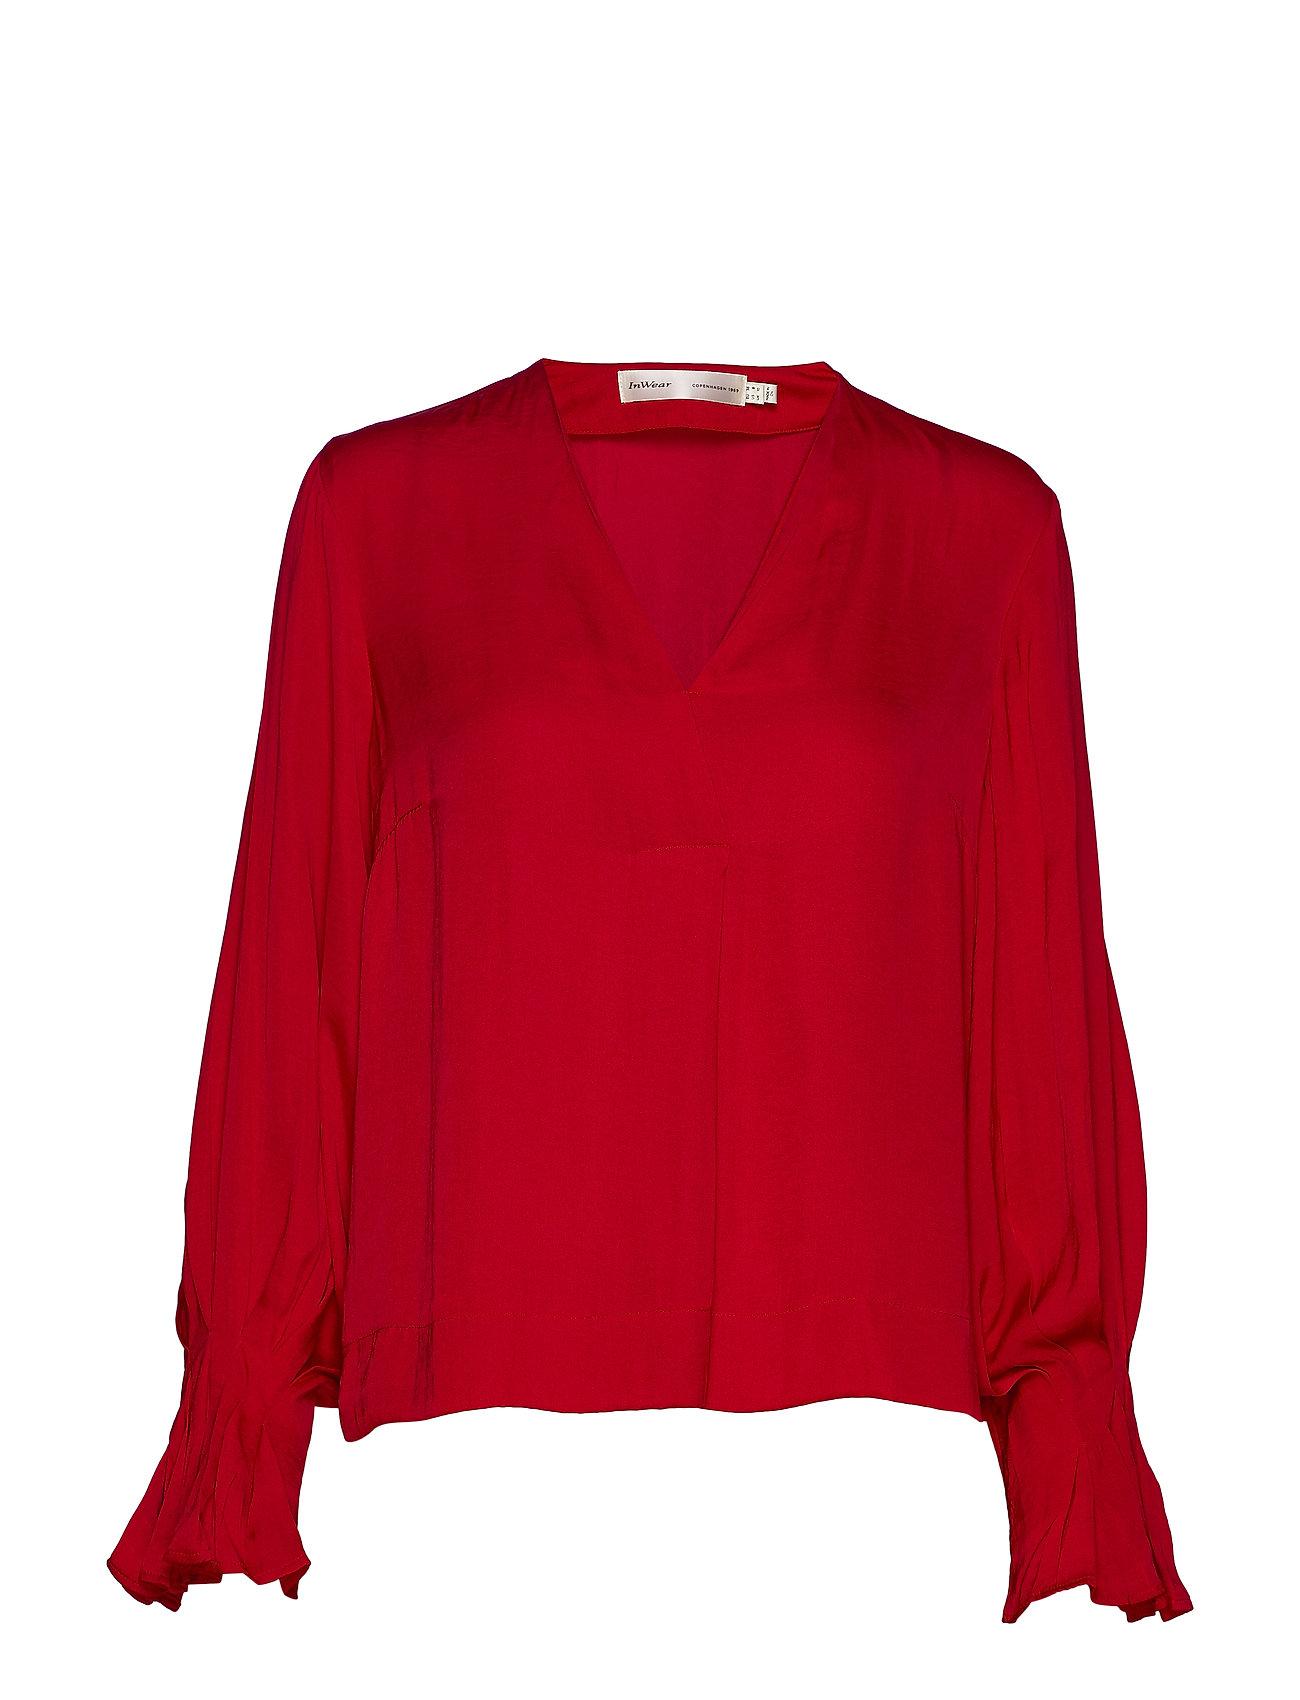 InWear ClaraIW Blouse - REAL RED